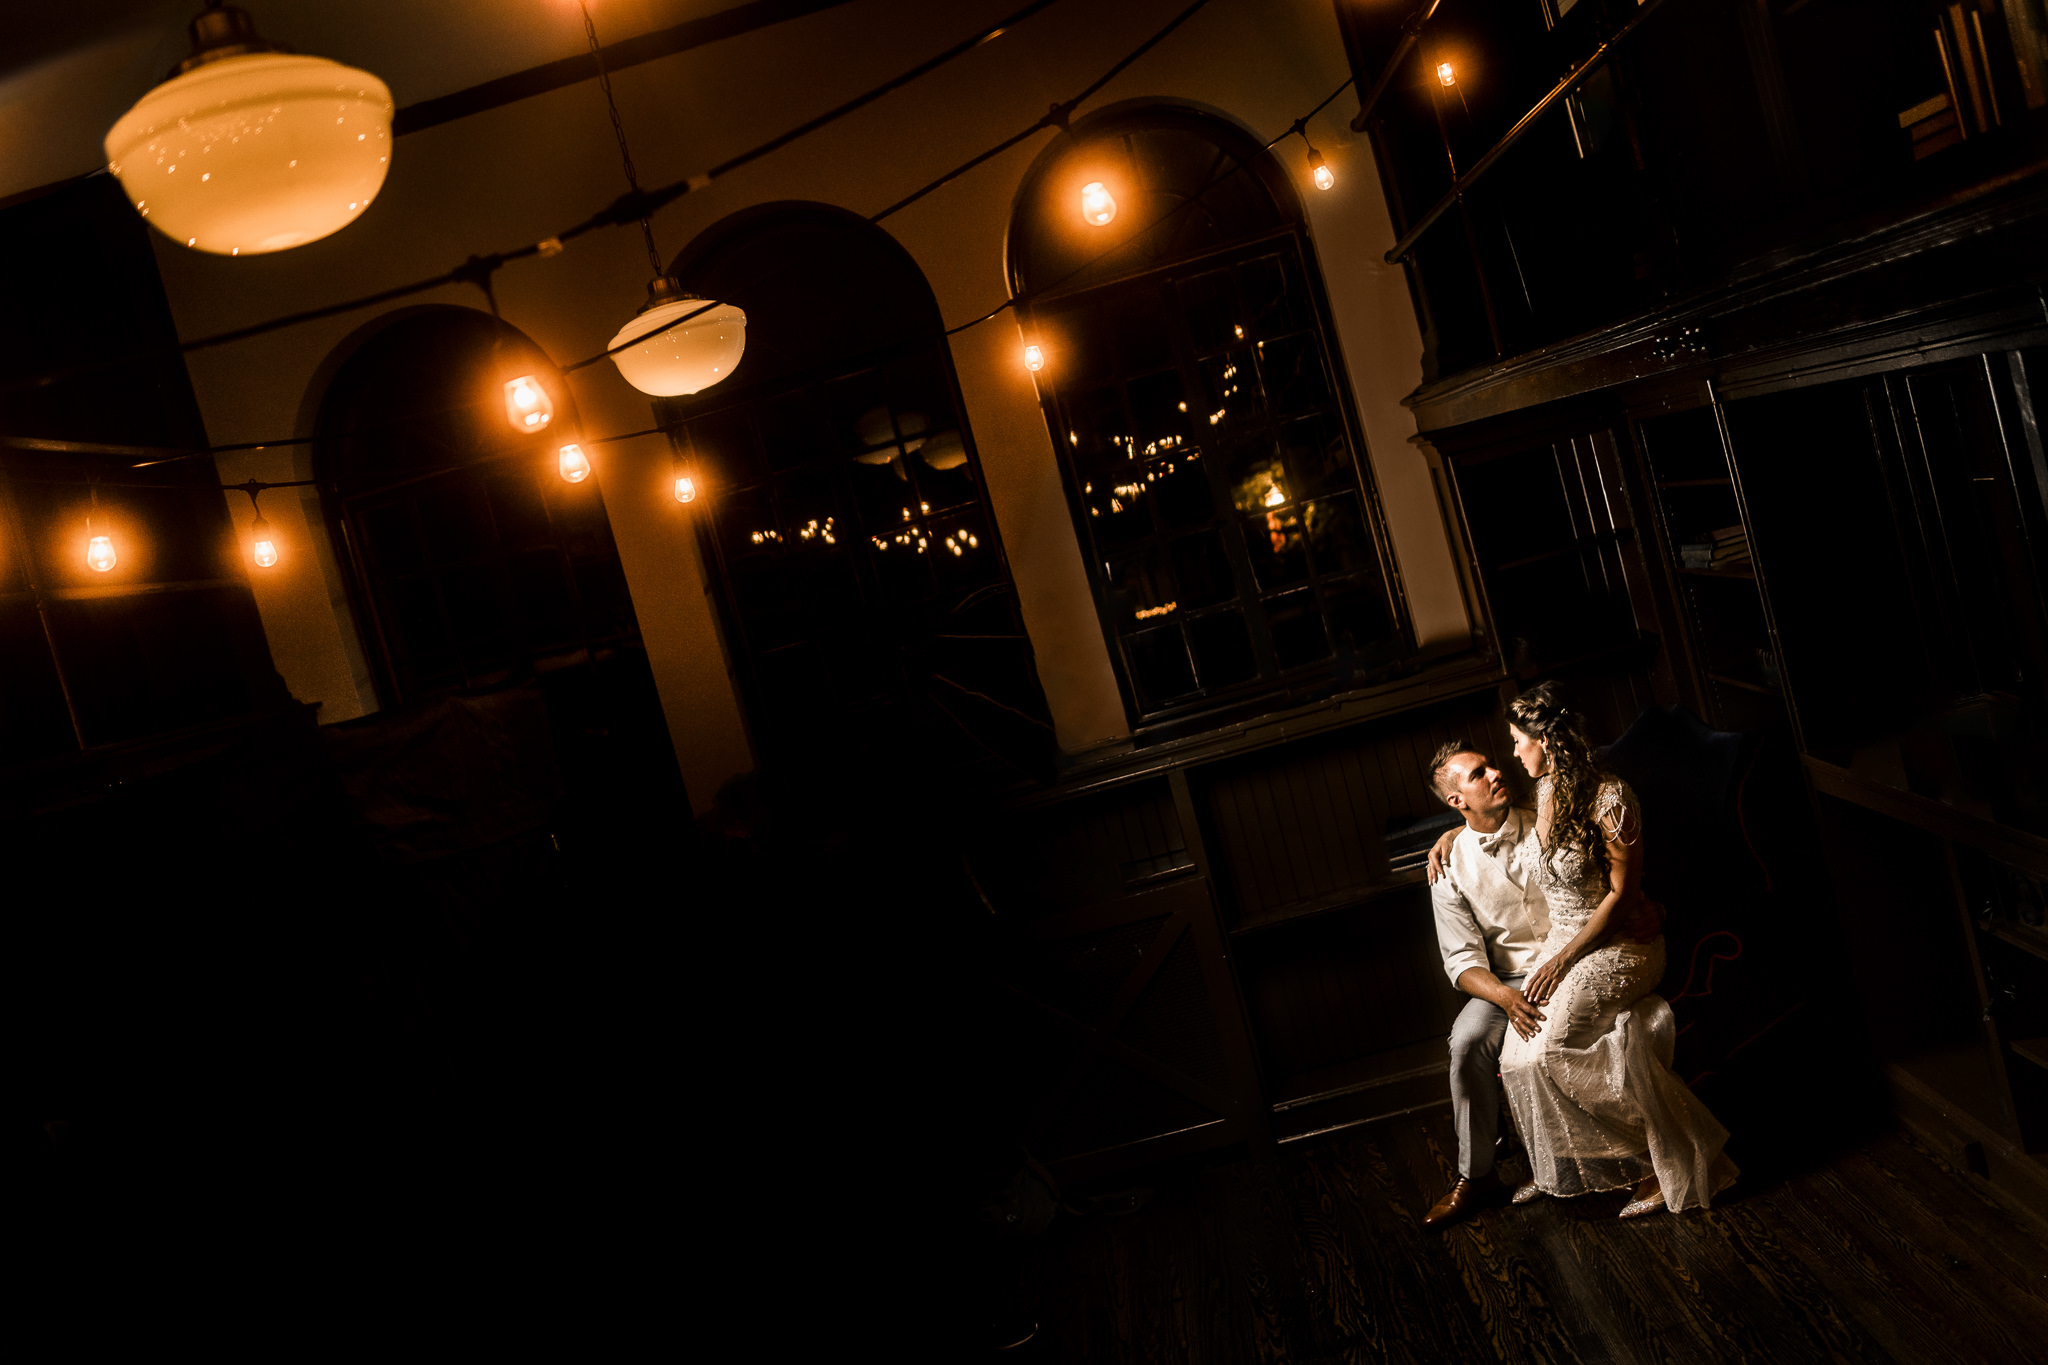 Barbato-Moorestown-Community-House-Wedding-New-Jersey-Photographer-46.JPG